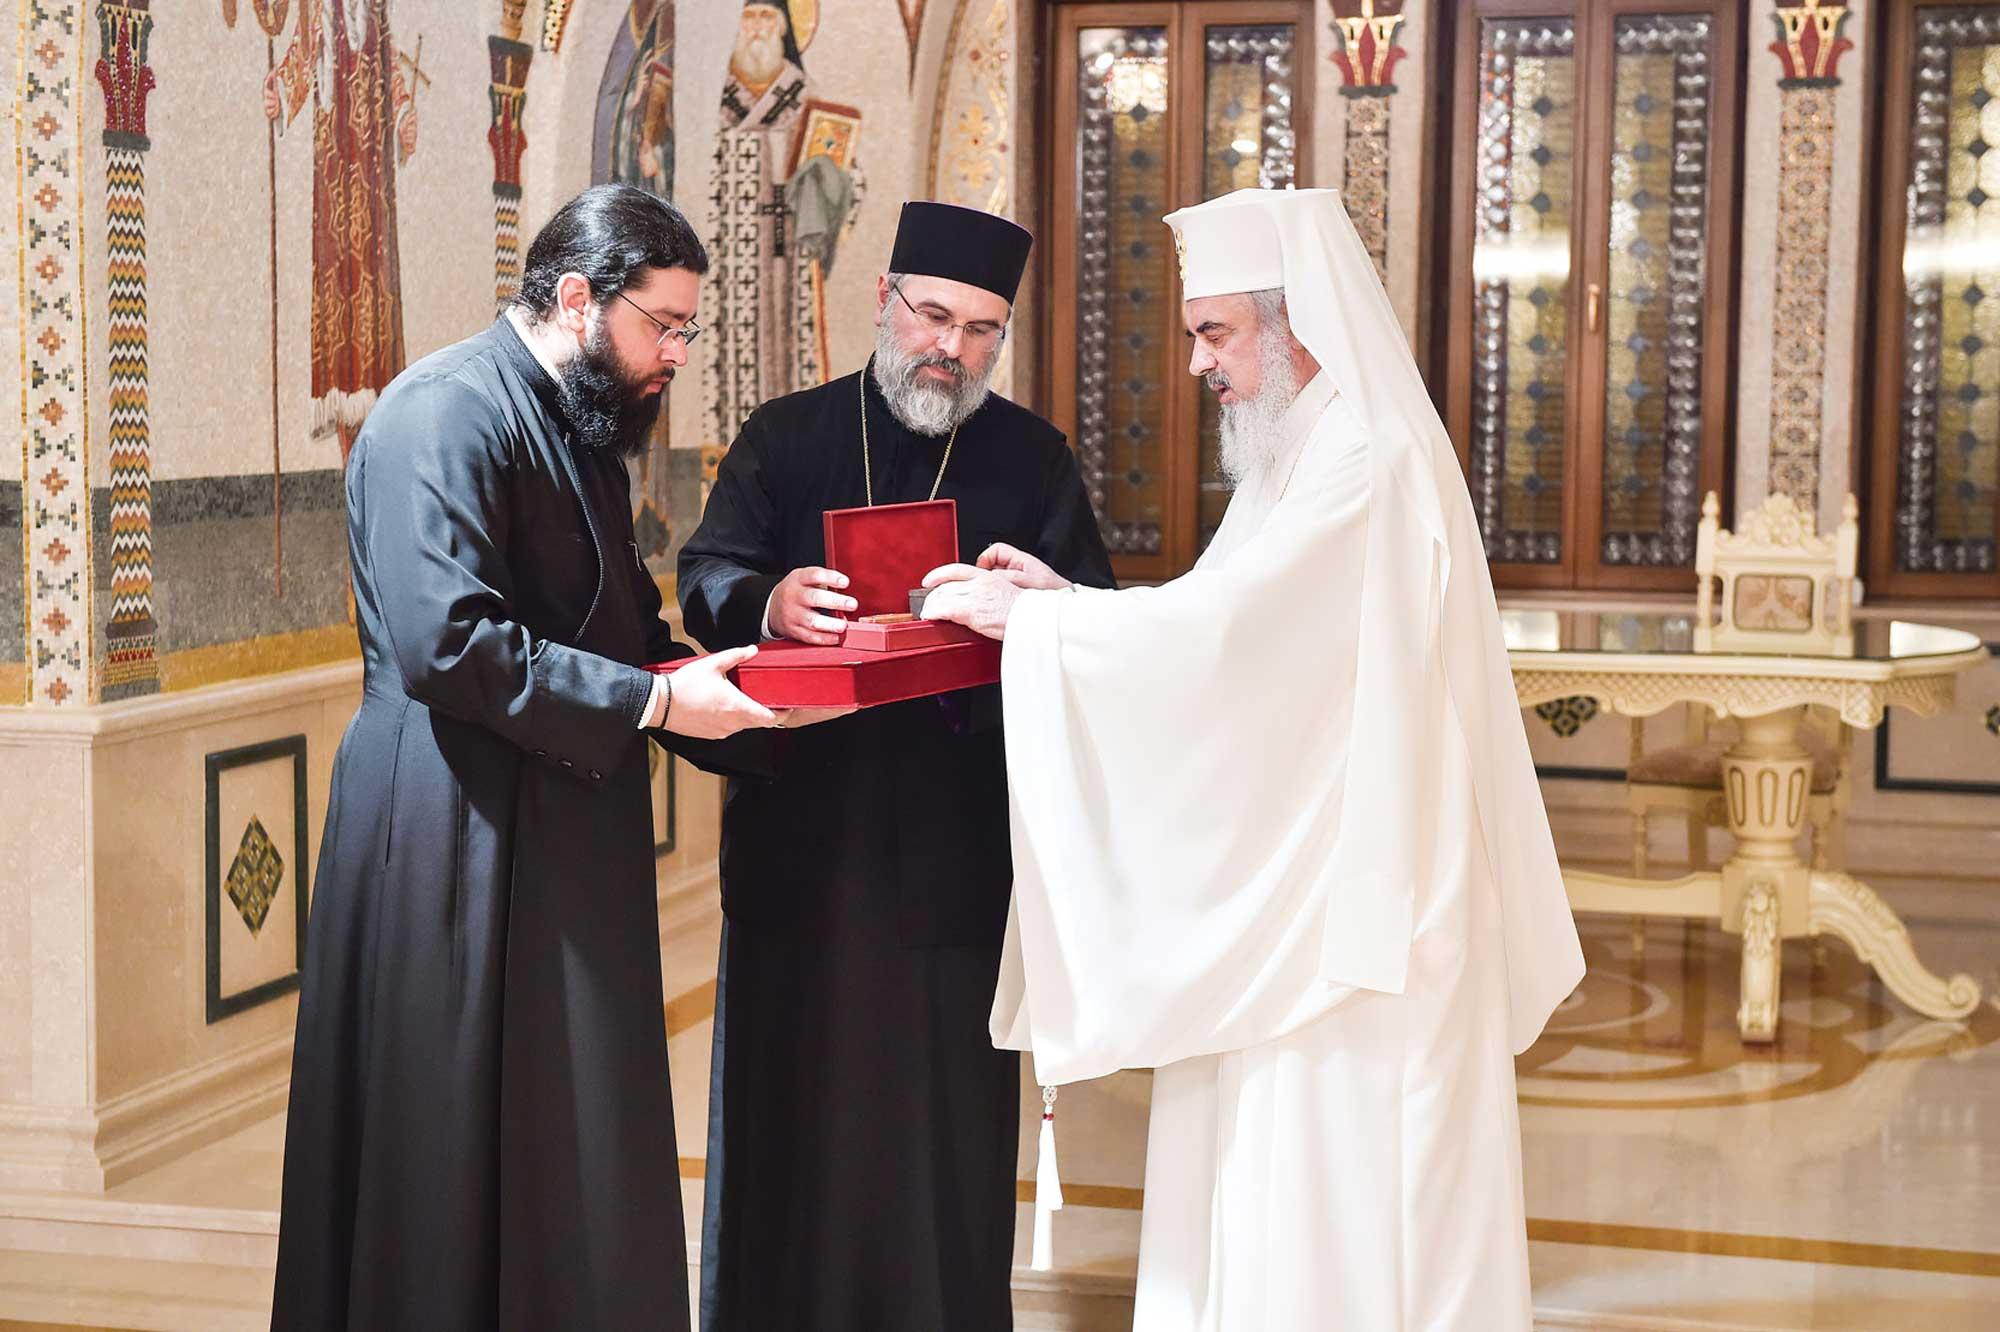 Sfinte moaște oferite Episcopiei Ortodoxe Române a Canadei